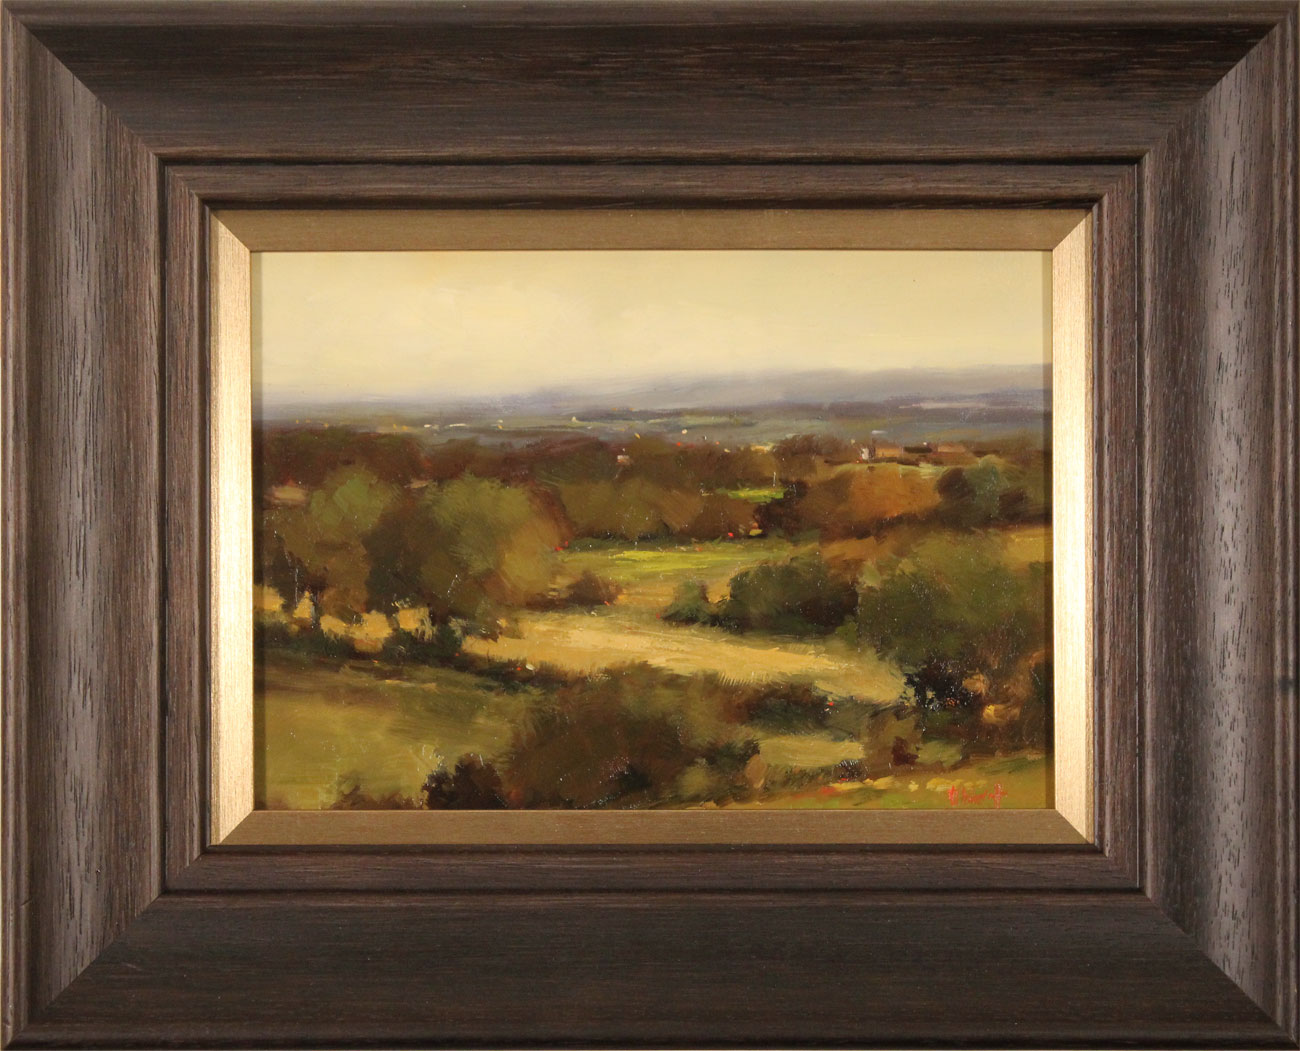 Michael John Ashcroft, AROI, Original oil painting on panel, On the Edge of Autumn. Click to enlarge